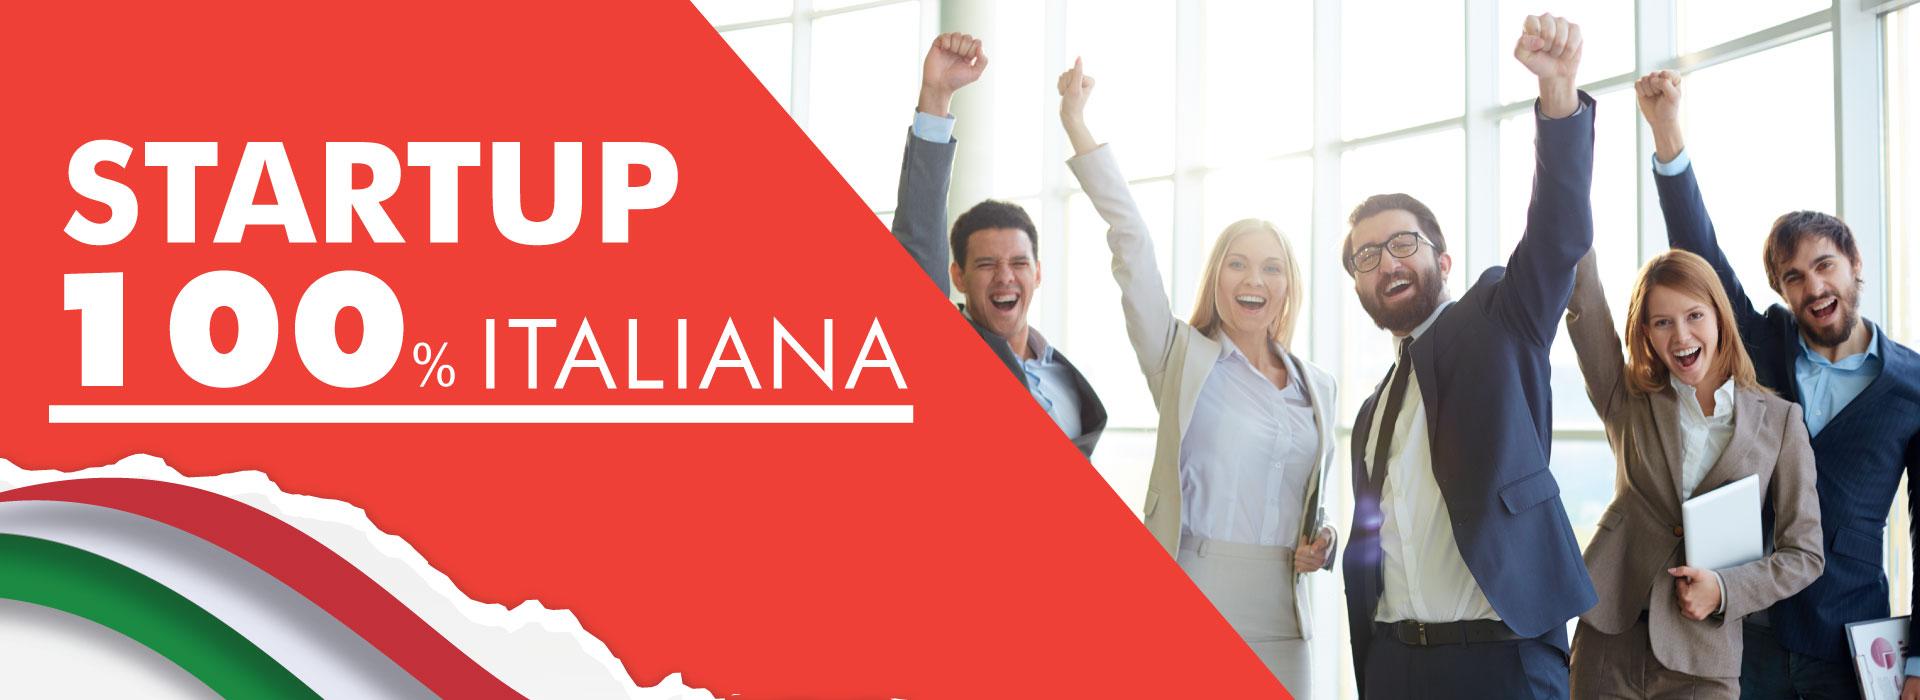 Startup Italiana